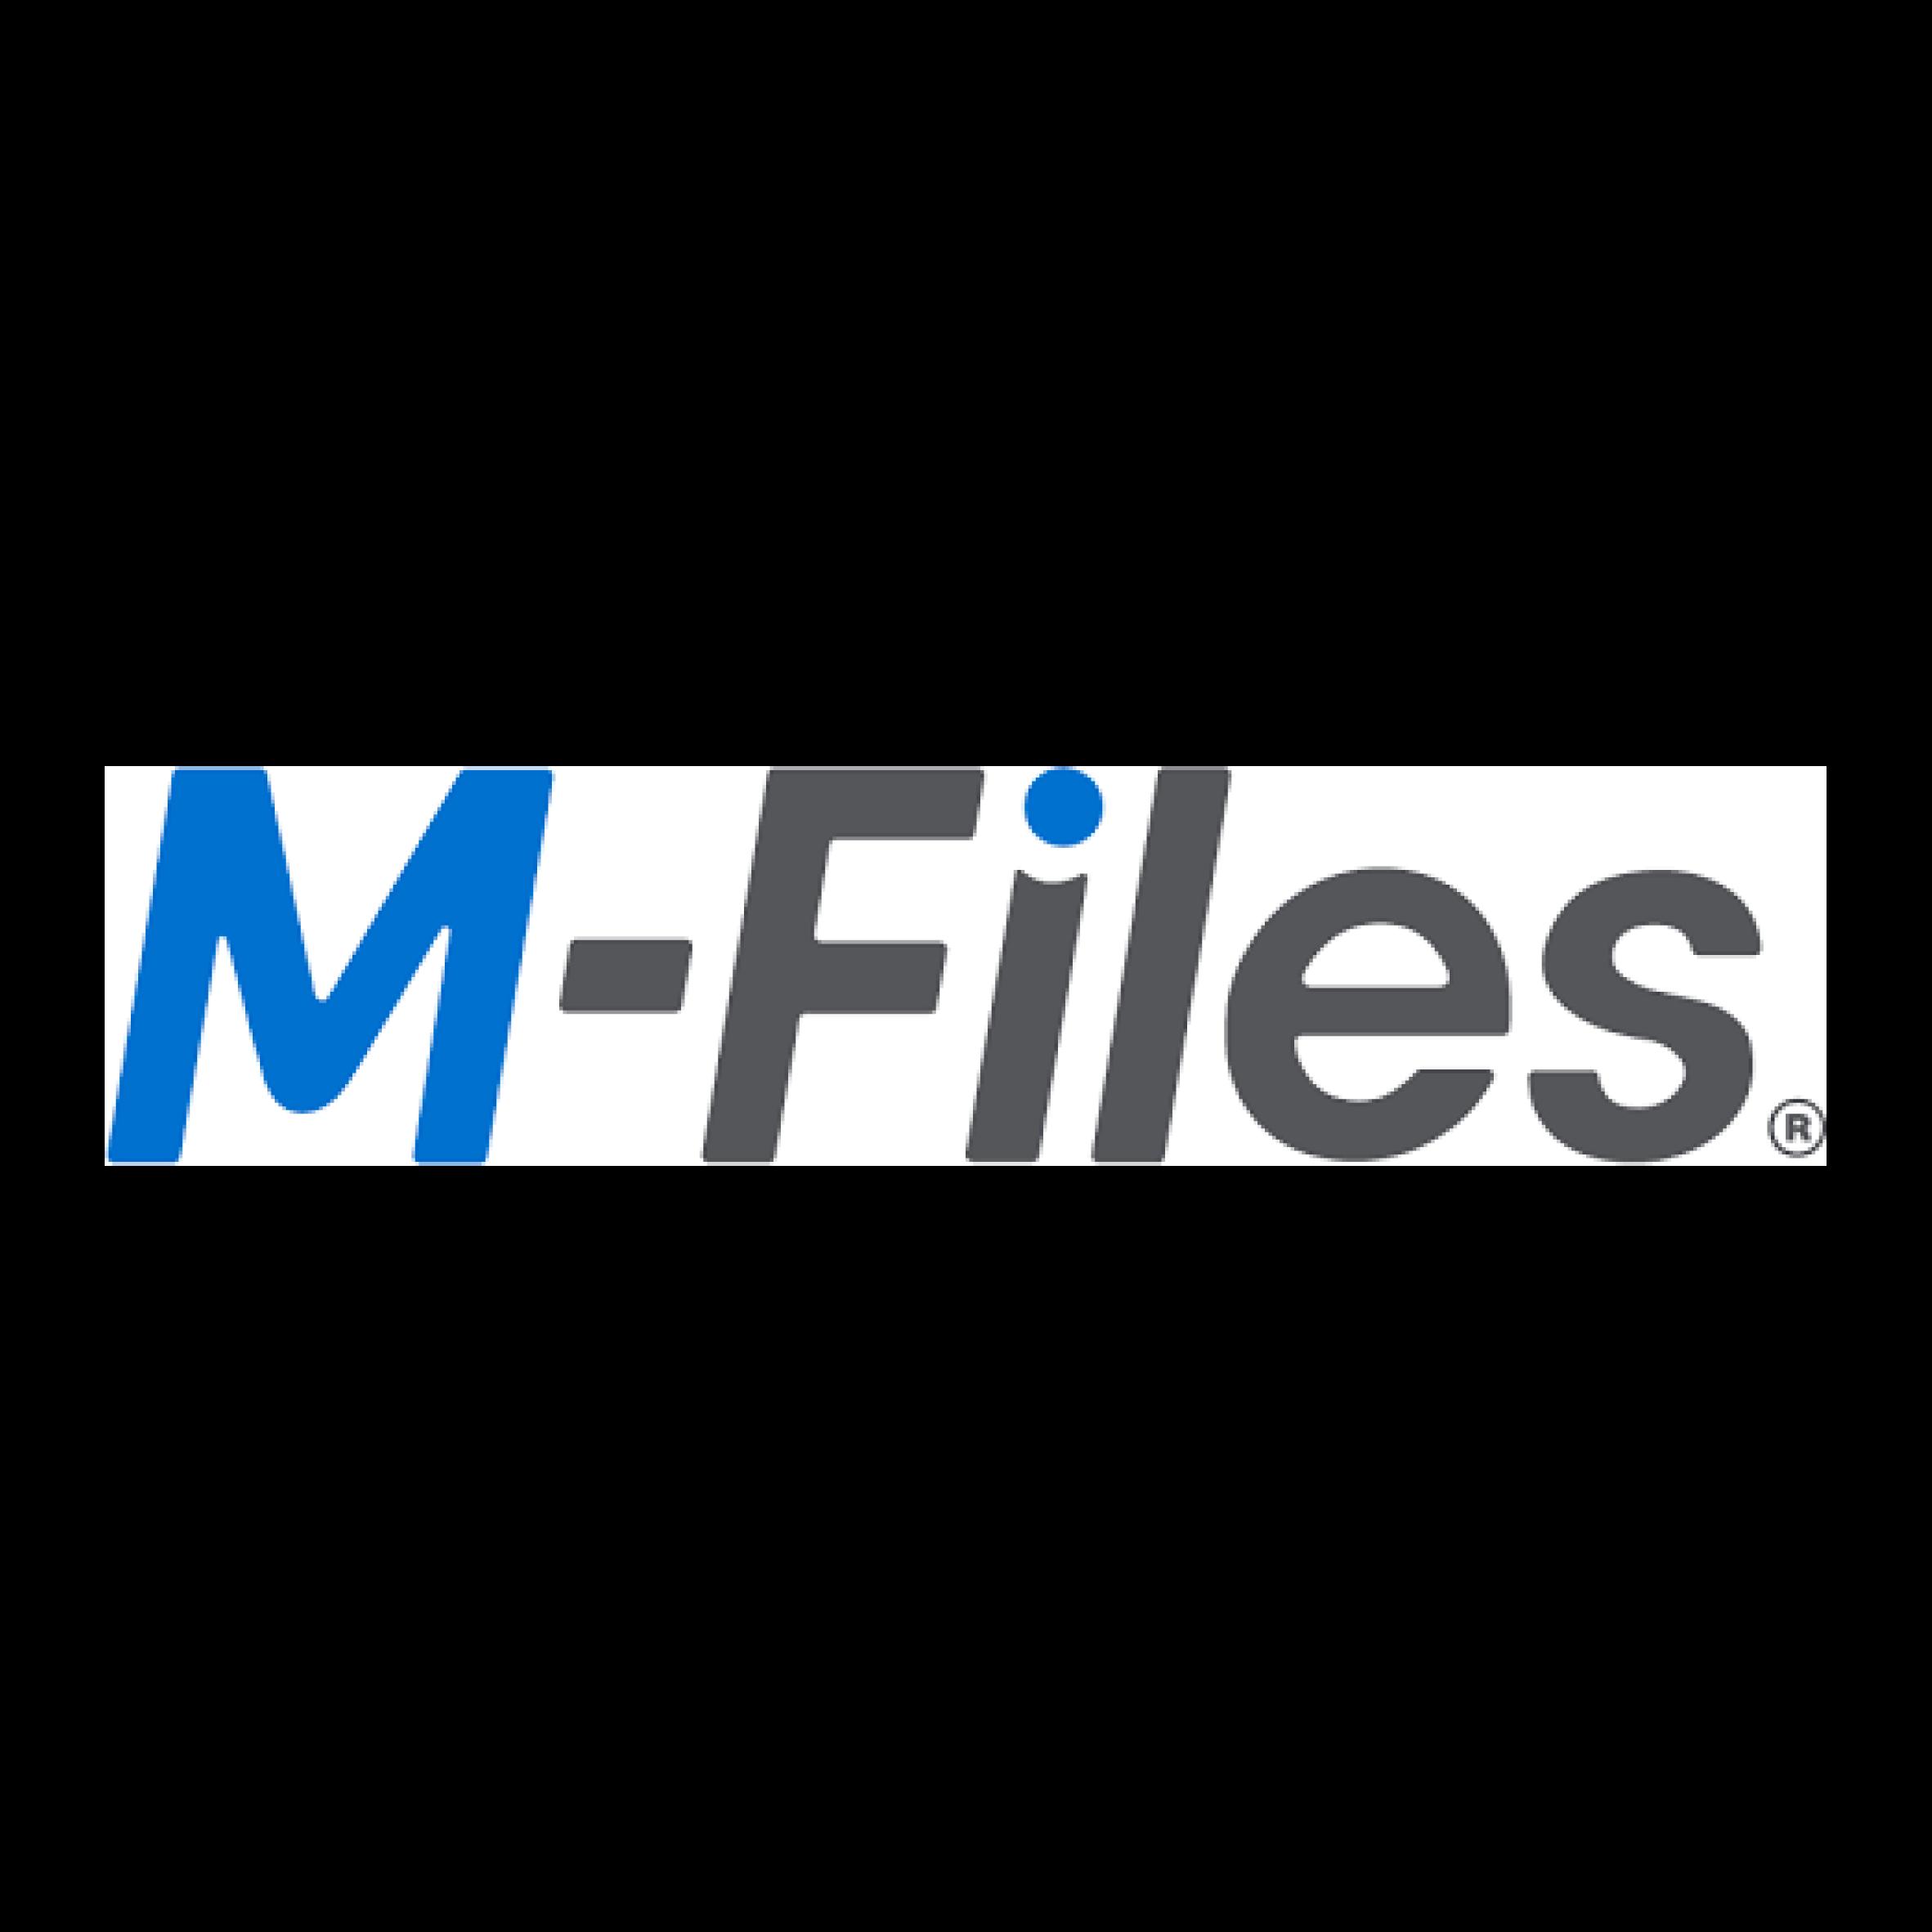 M-FILE